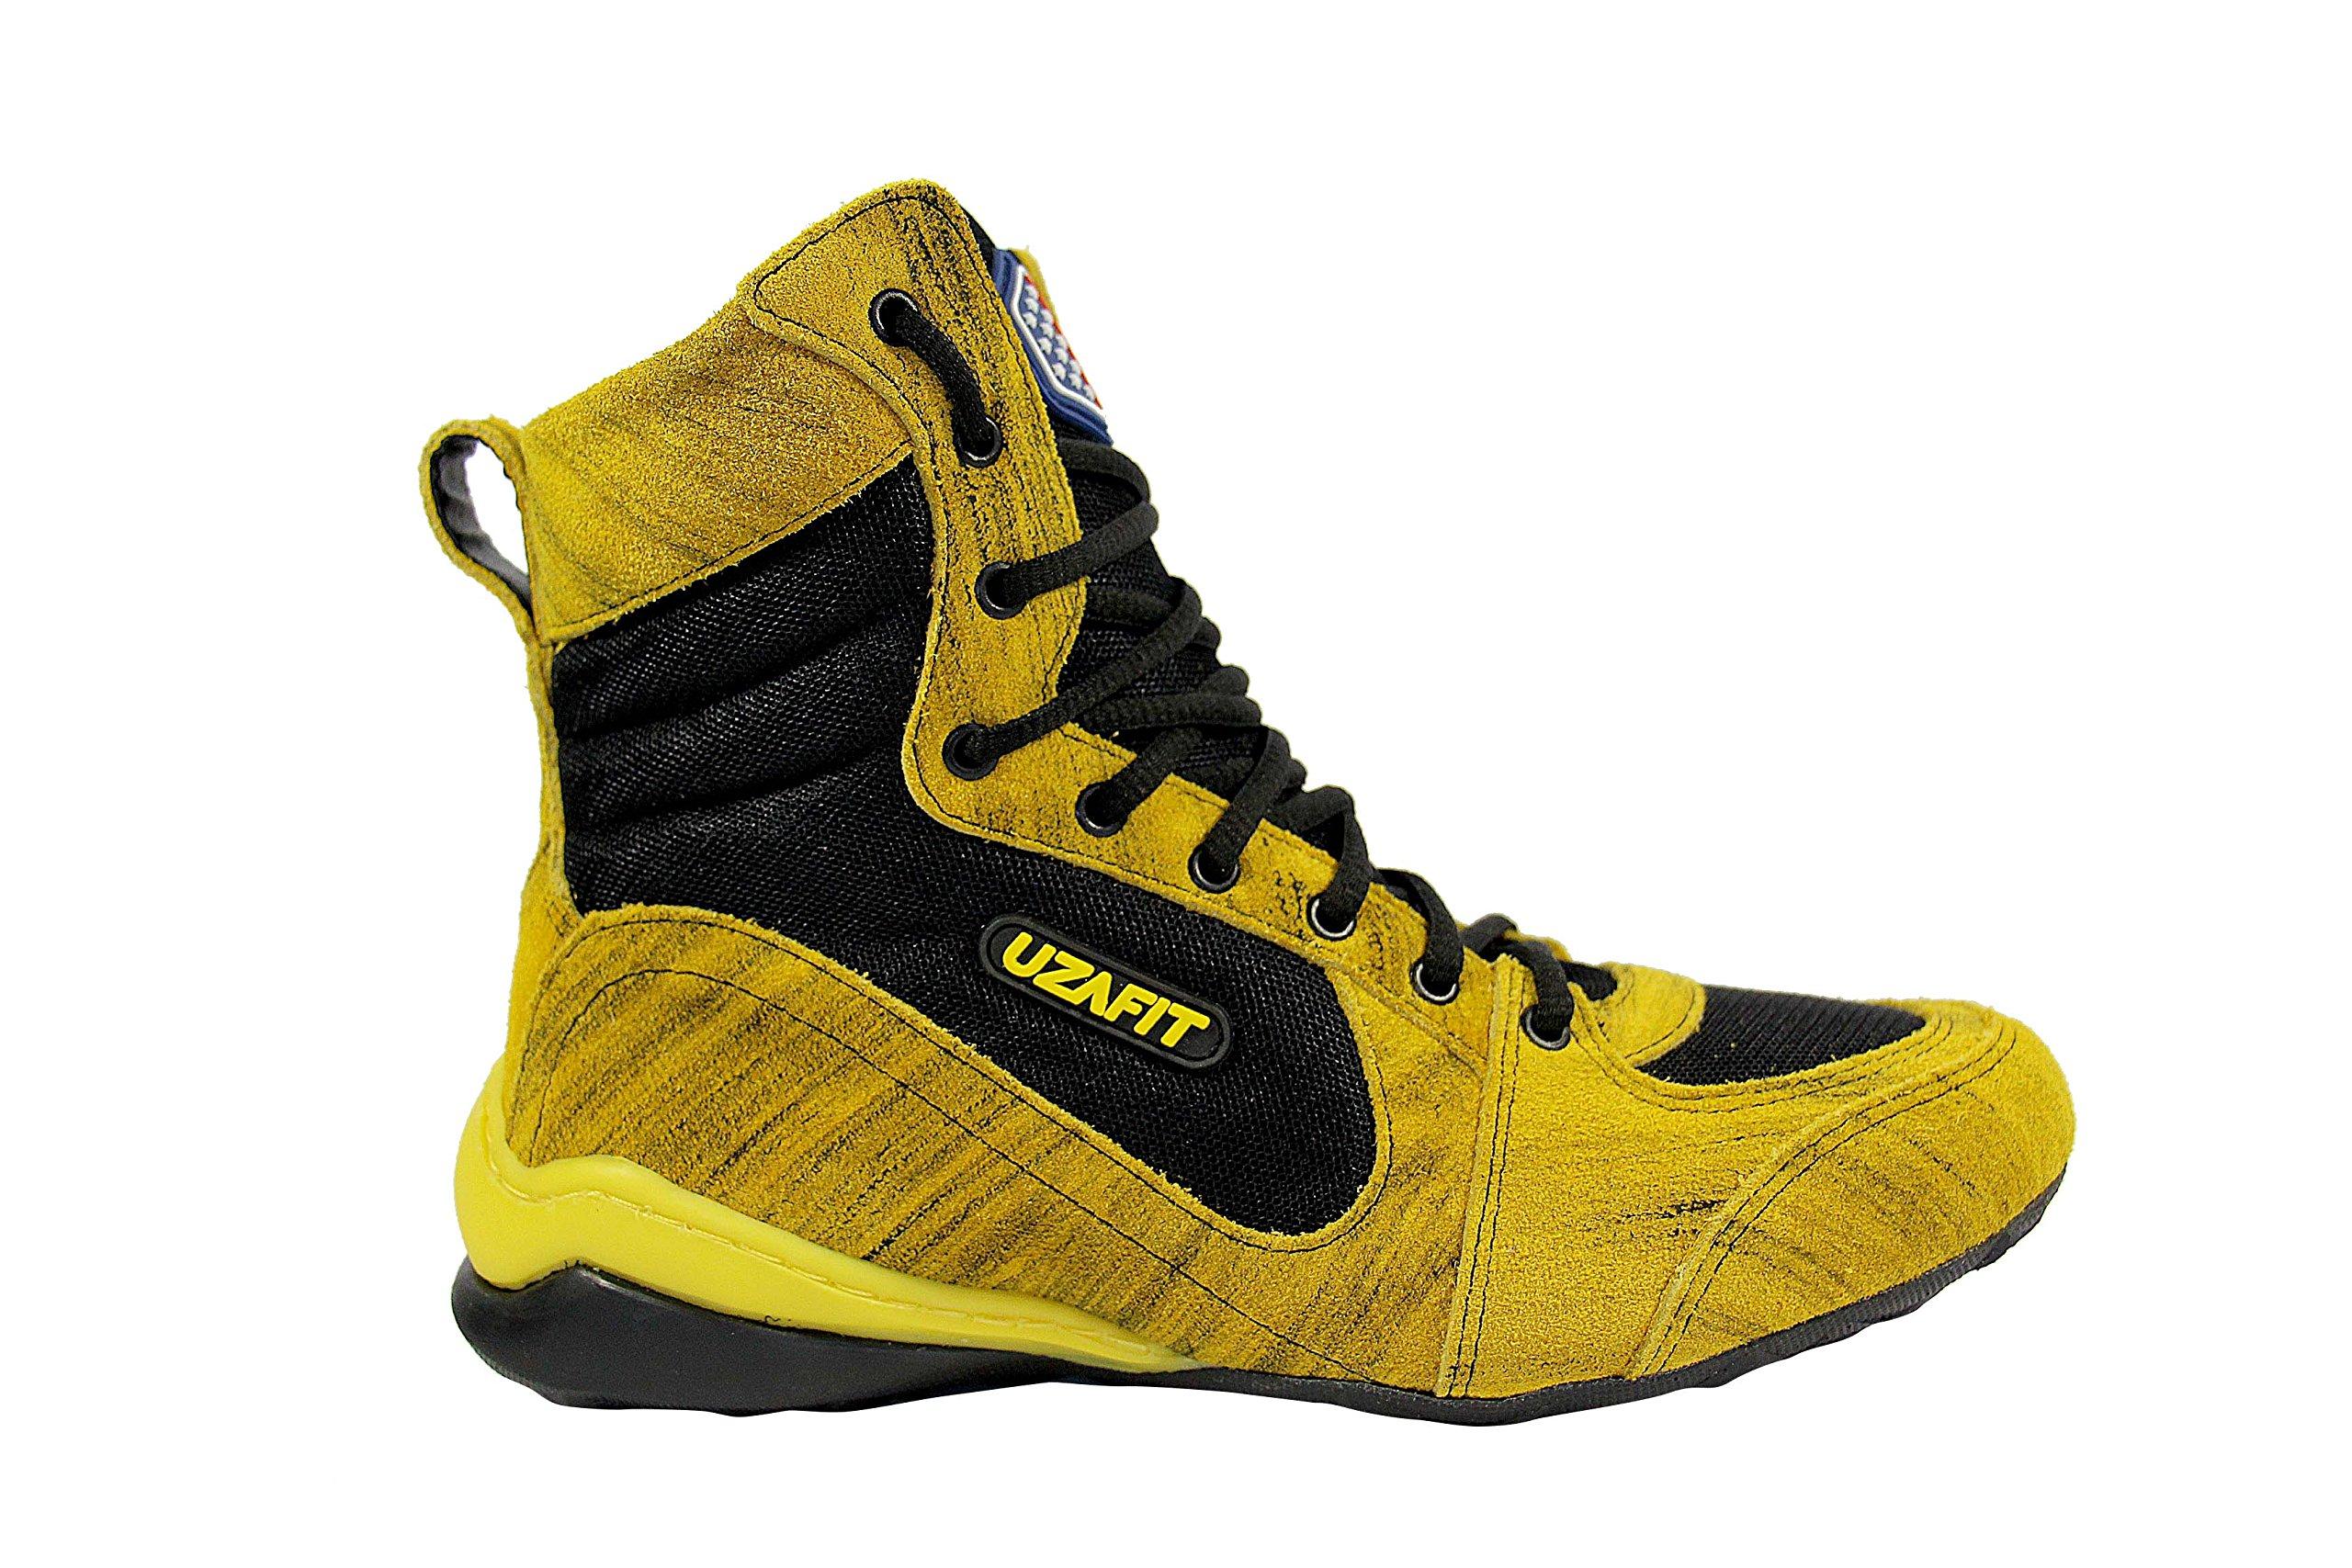 Uzafit Jackson Bodybuilding Weightlifting CrossFit Boxing Shoe Unisex Sneaker